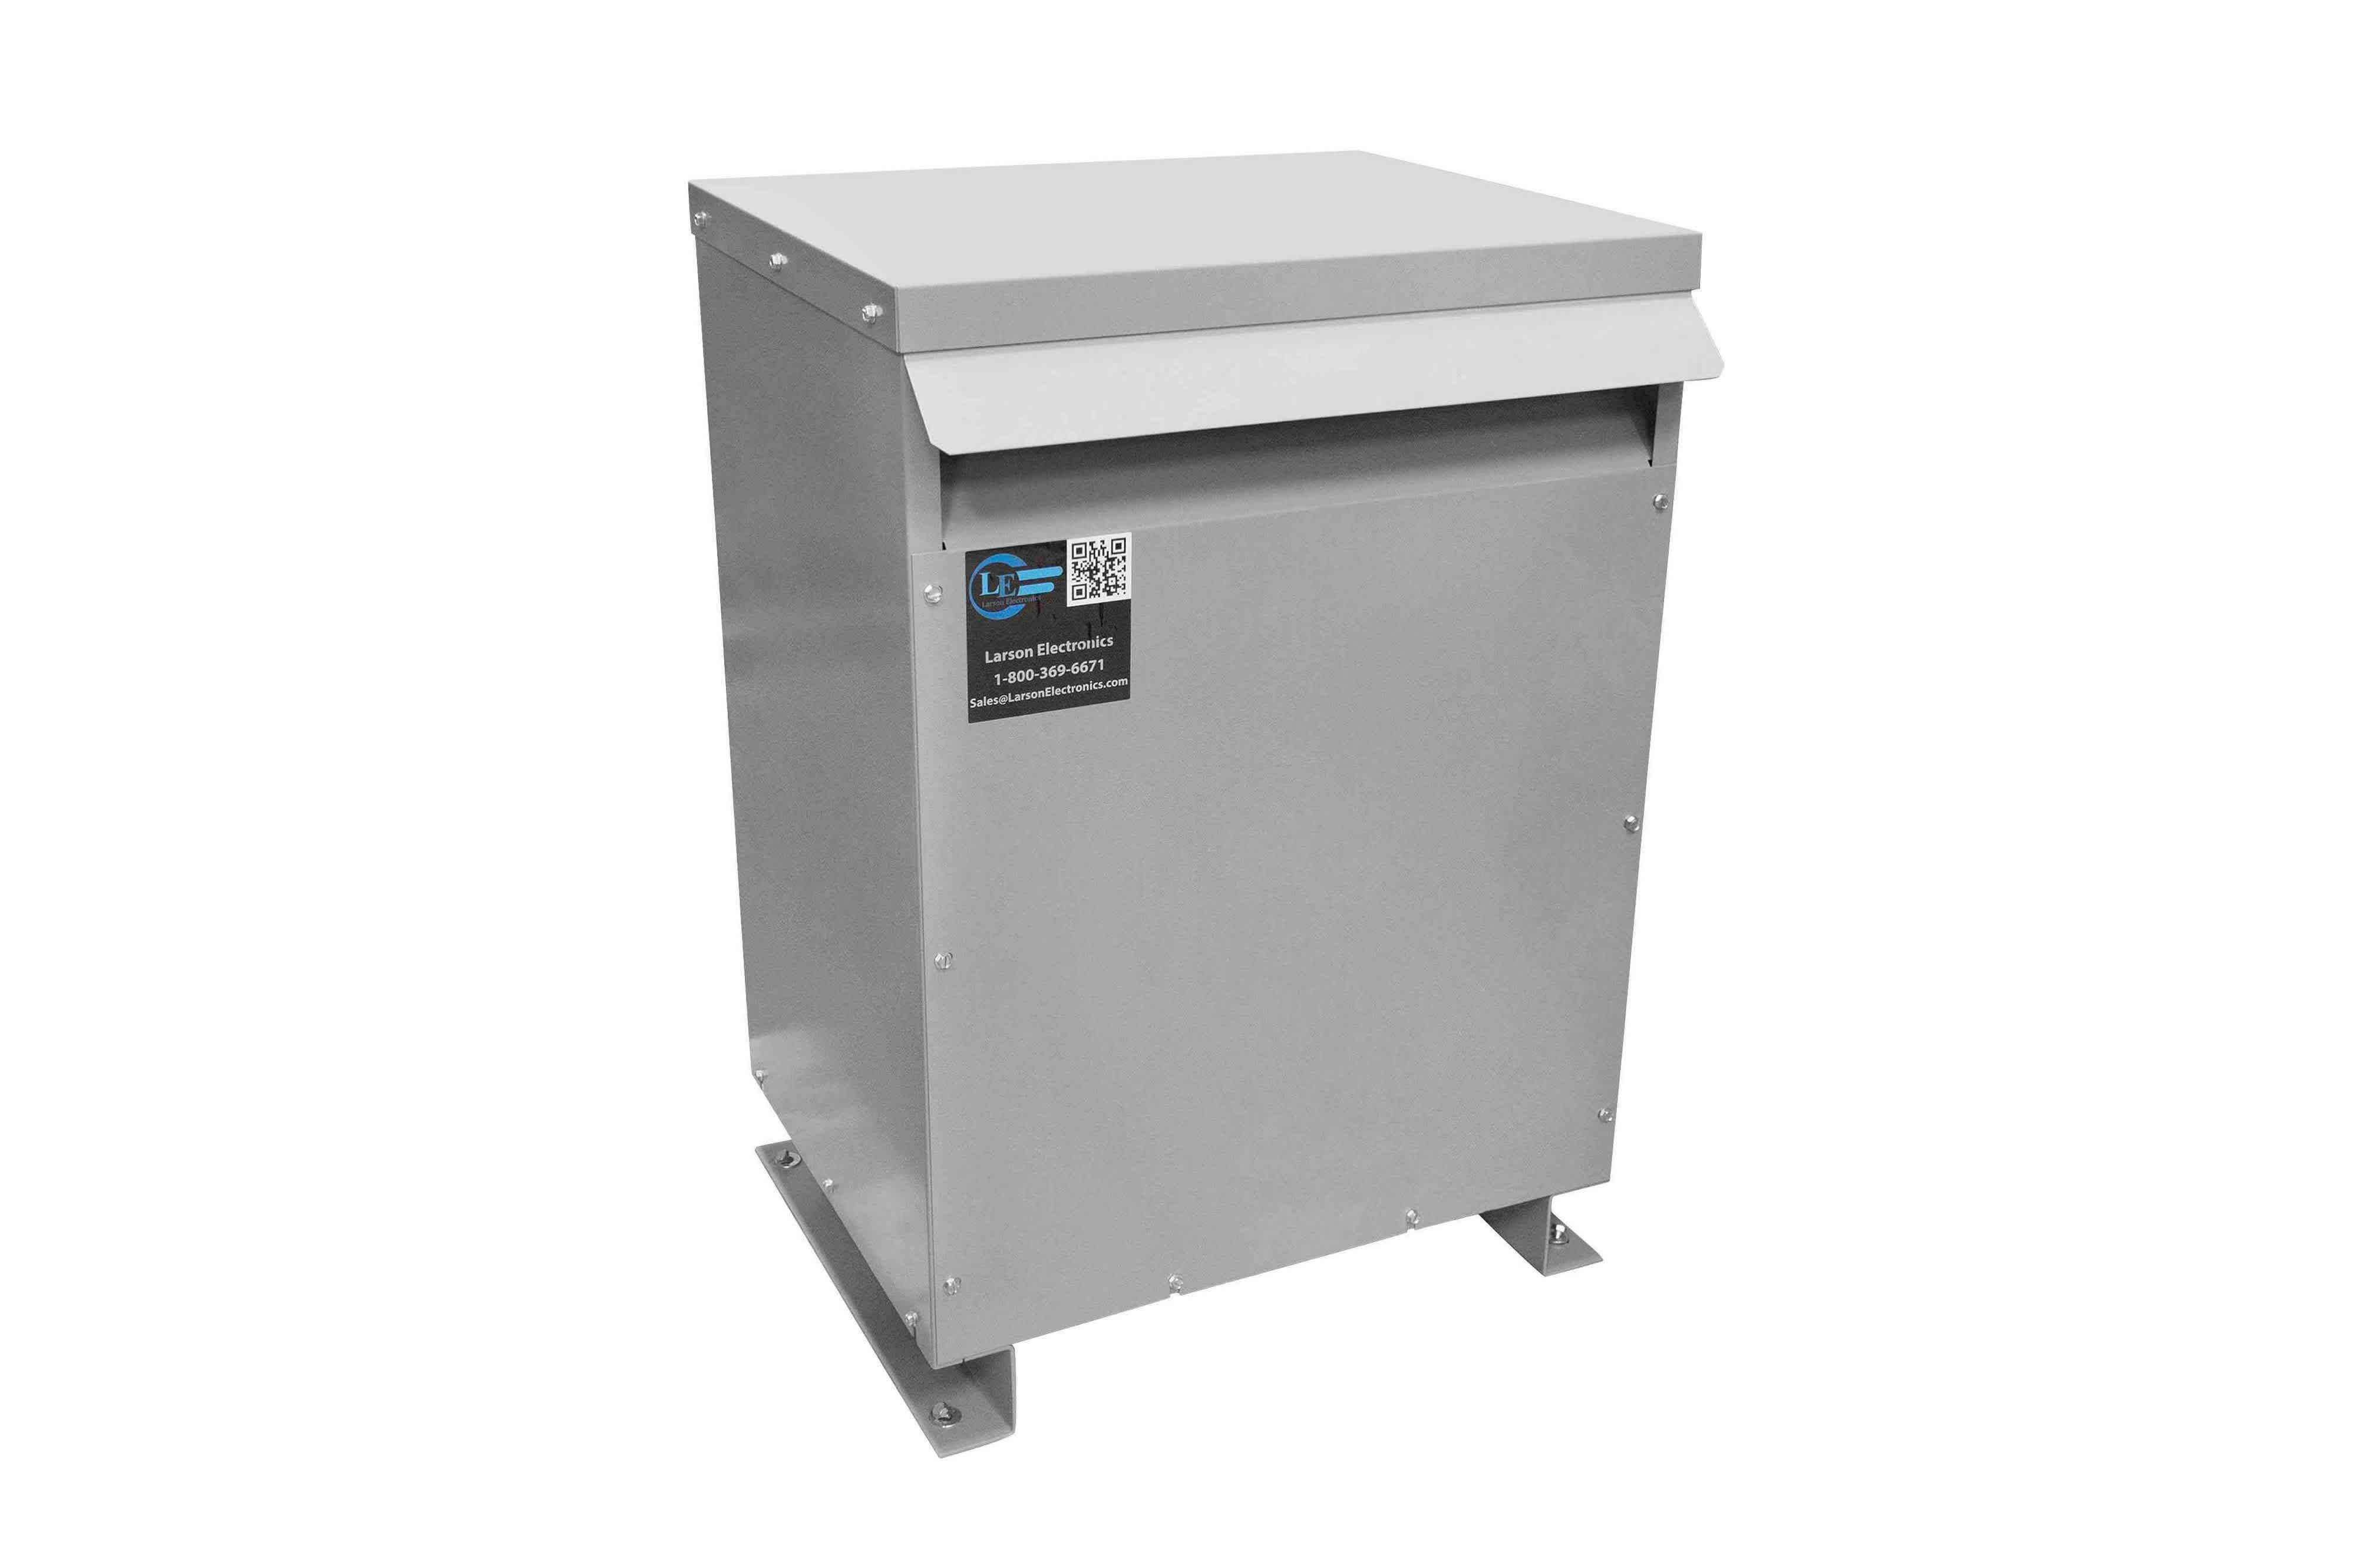 70 kVA 3PH Isolation Transformer, 380V Wye Primary, 208V Delta Secondary, N3R, Ventilated, 60 Hz